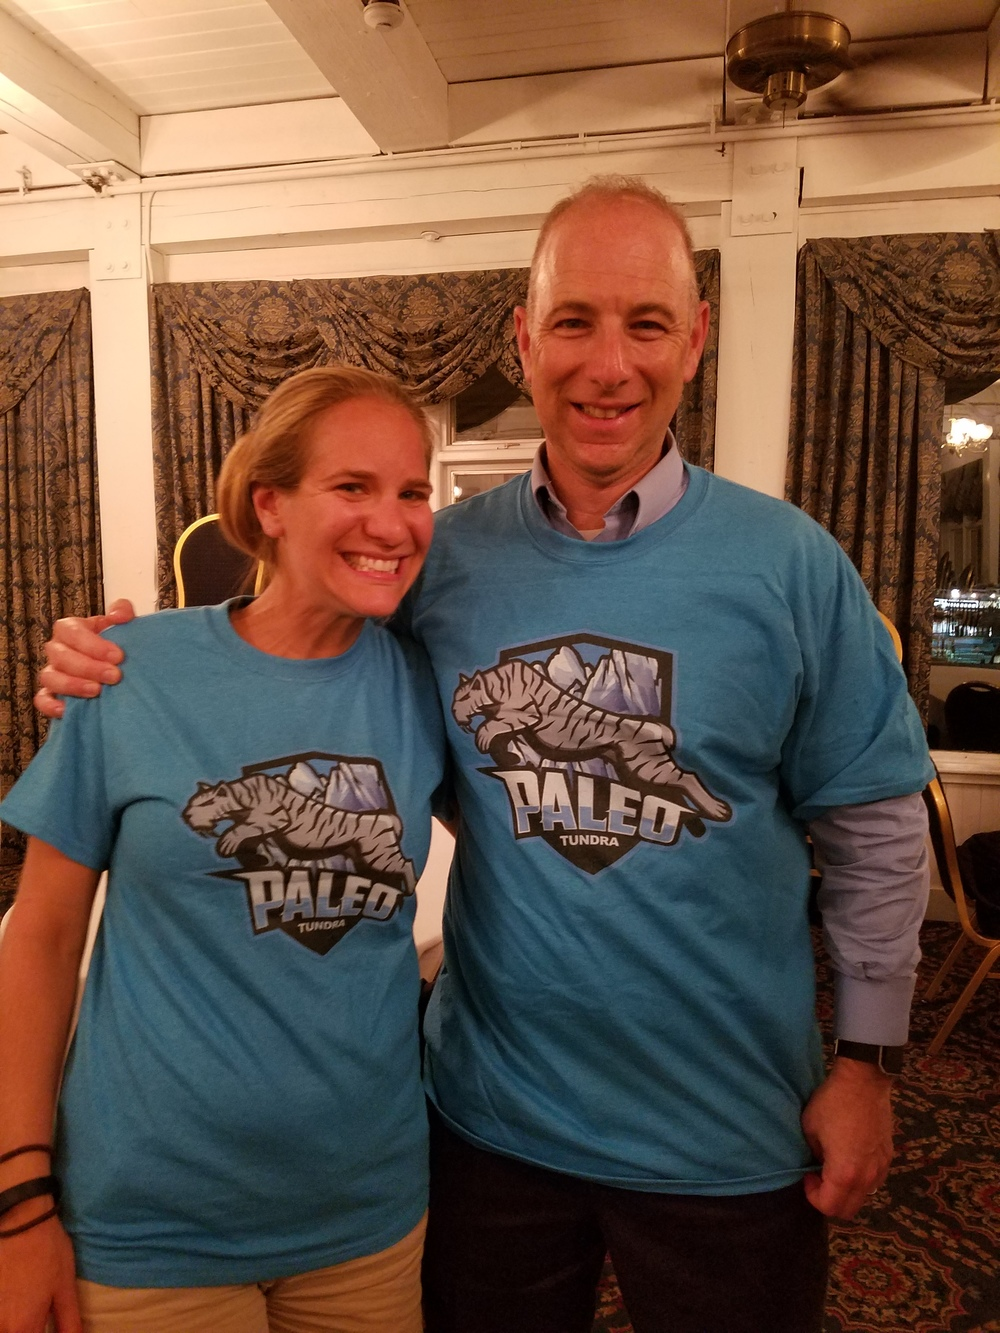 Seth and Wendy Paleo Tundra.jpg